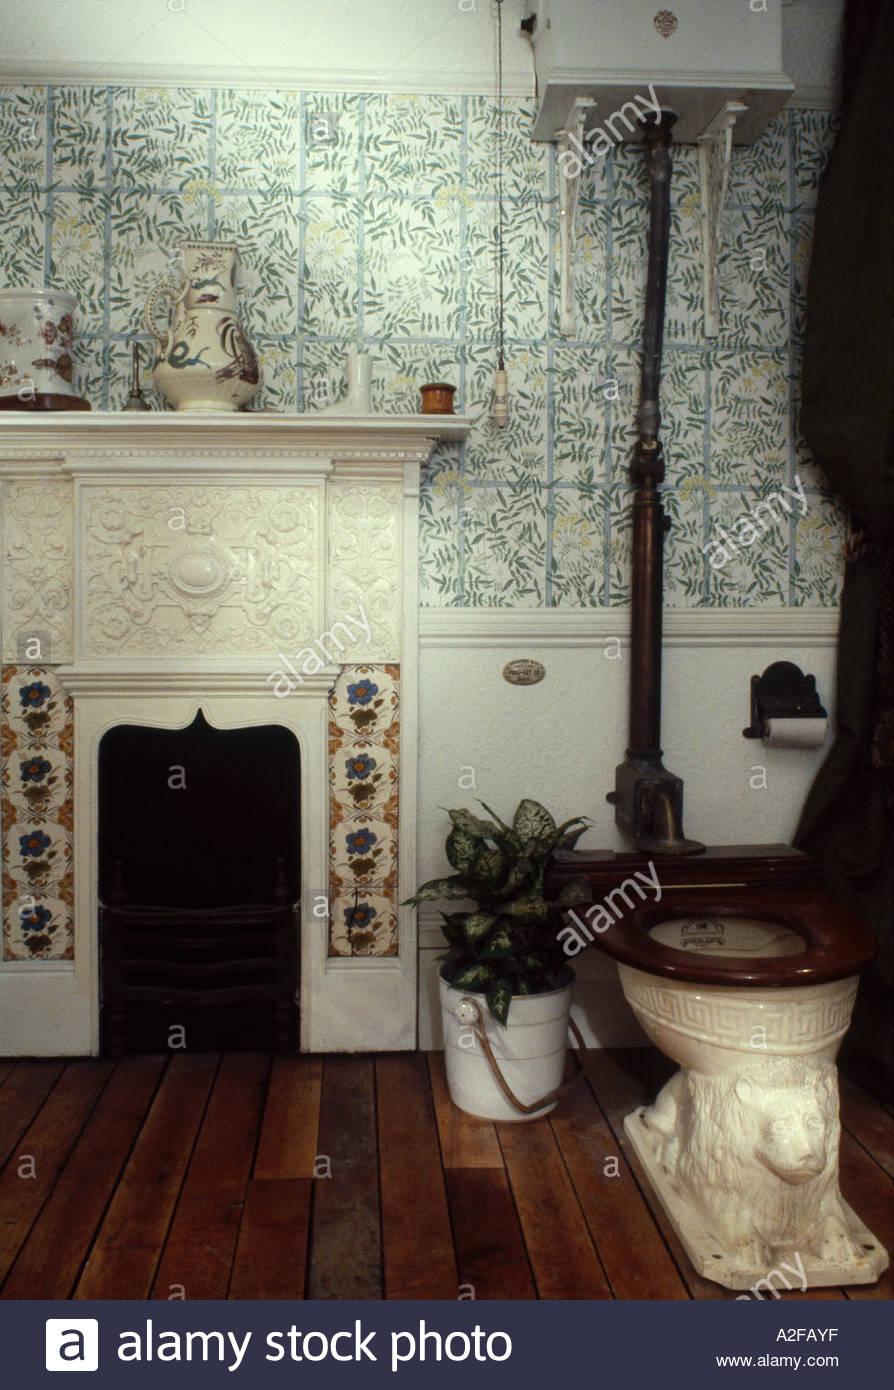 Bathroom set for Adamez, Ideal Home Exhibition, 1980. Featuring an Edward Johns 'Pedestal Lion Closet', c1880s. - Stock Image